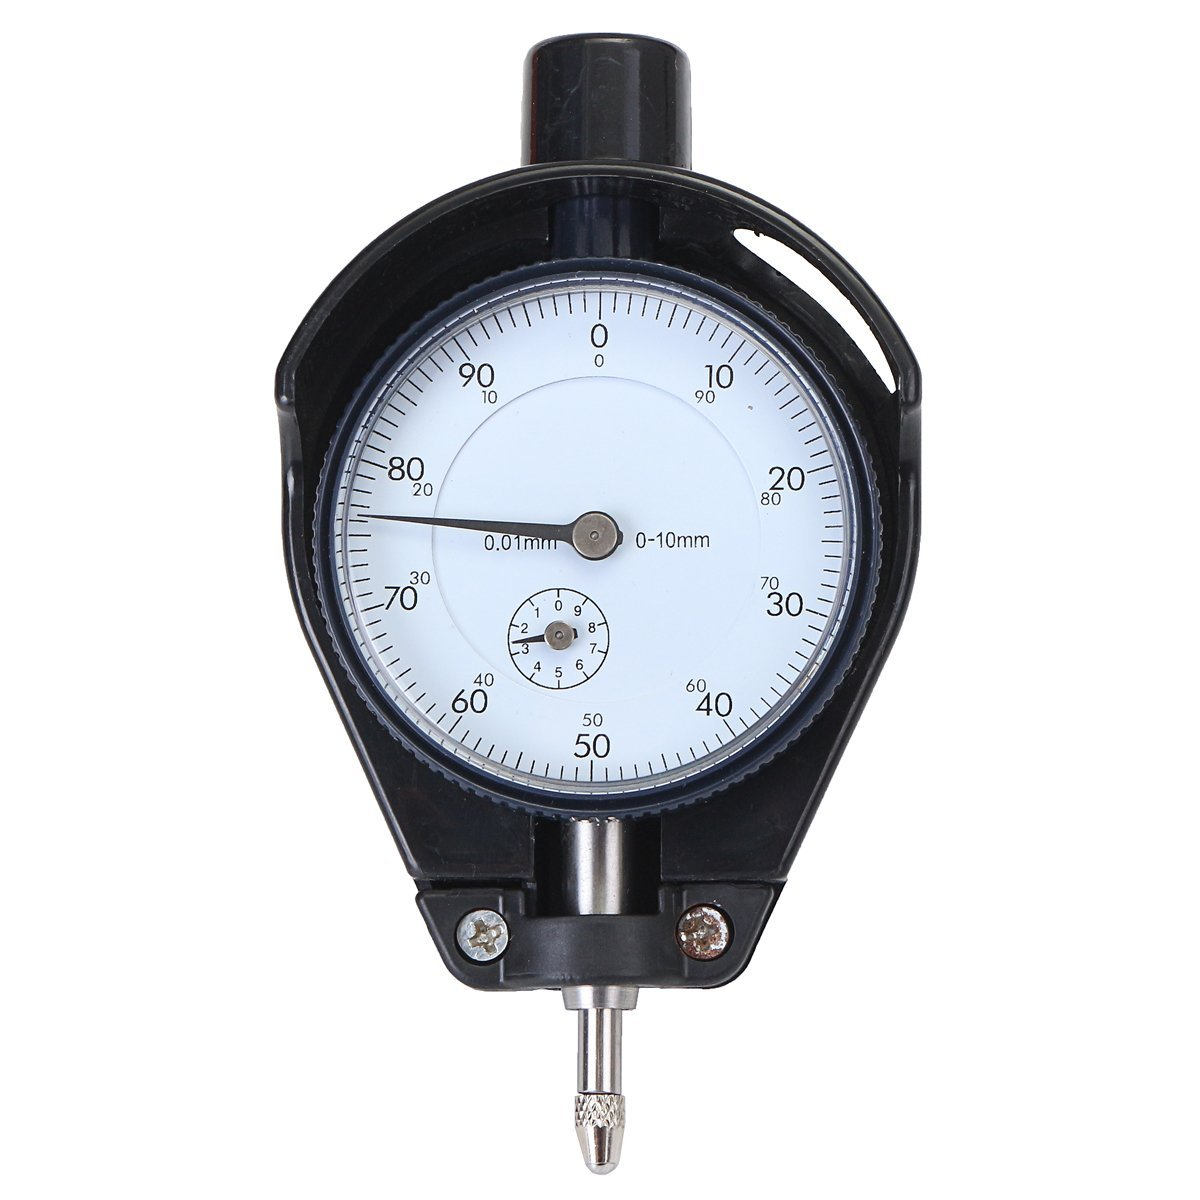 50-160MM Accuracy 0.01MM Indicator Inner Diameter Dial Bore Gauge